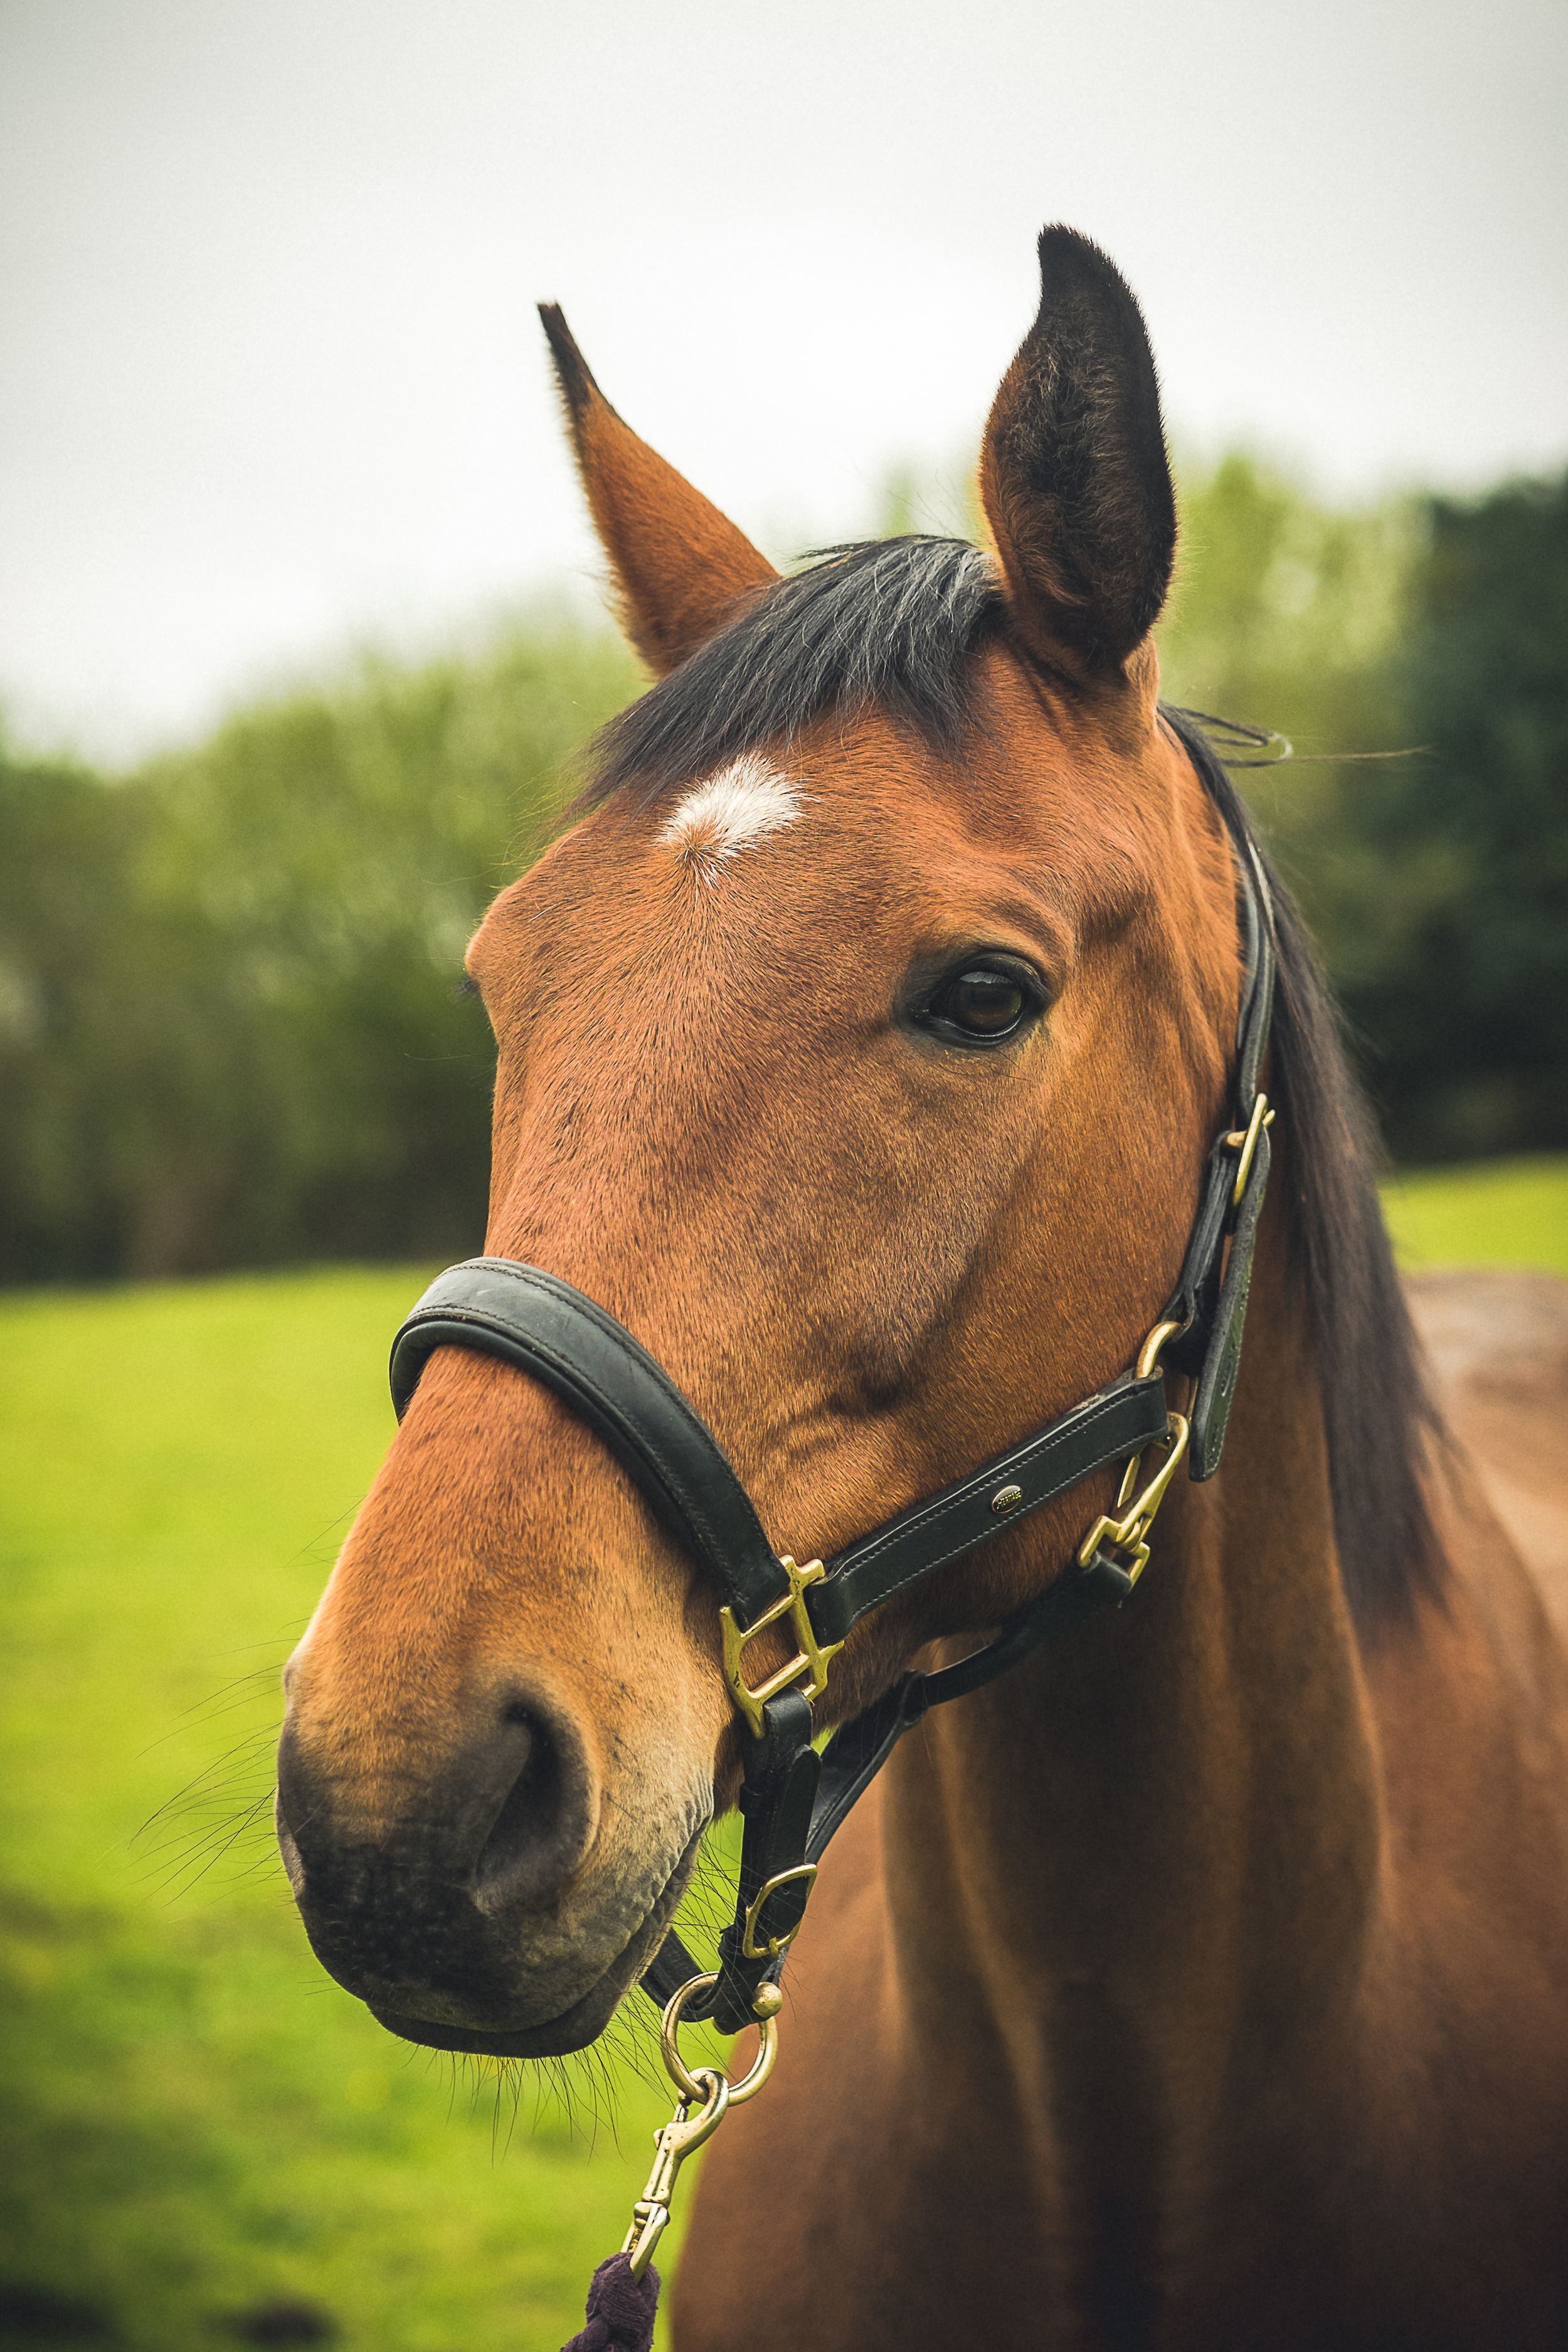 3rd_may_2014_horse_photography-22.jpg